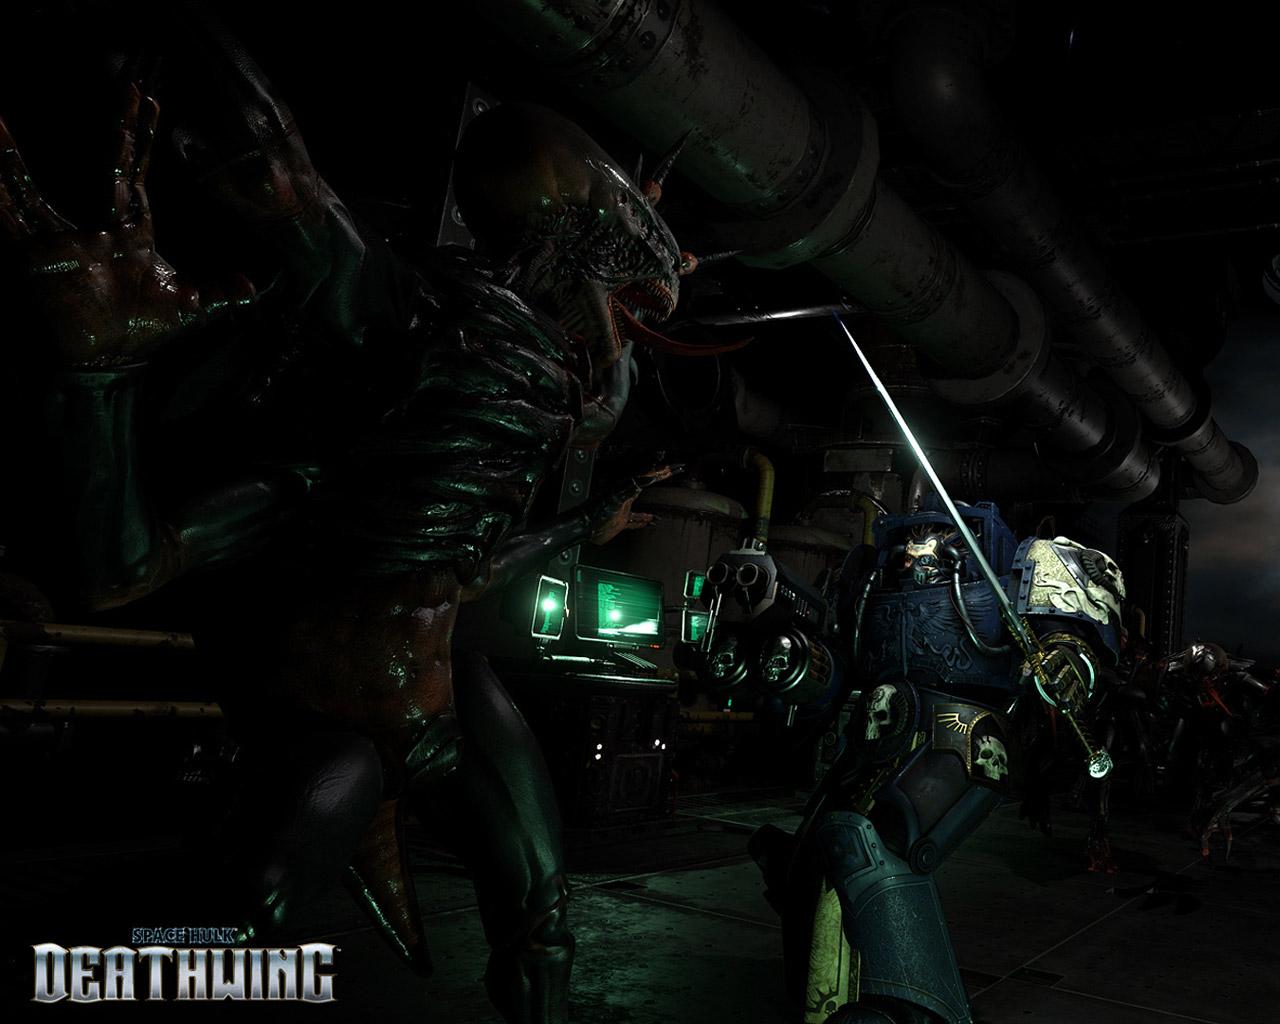 Free Space Hulk: Deathwing Wallpaper in 1280x1024